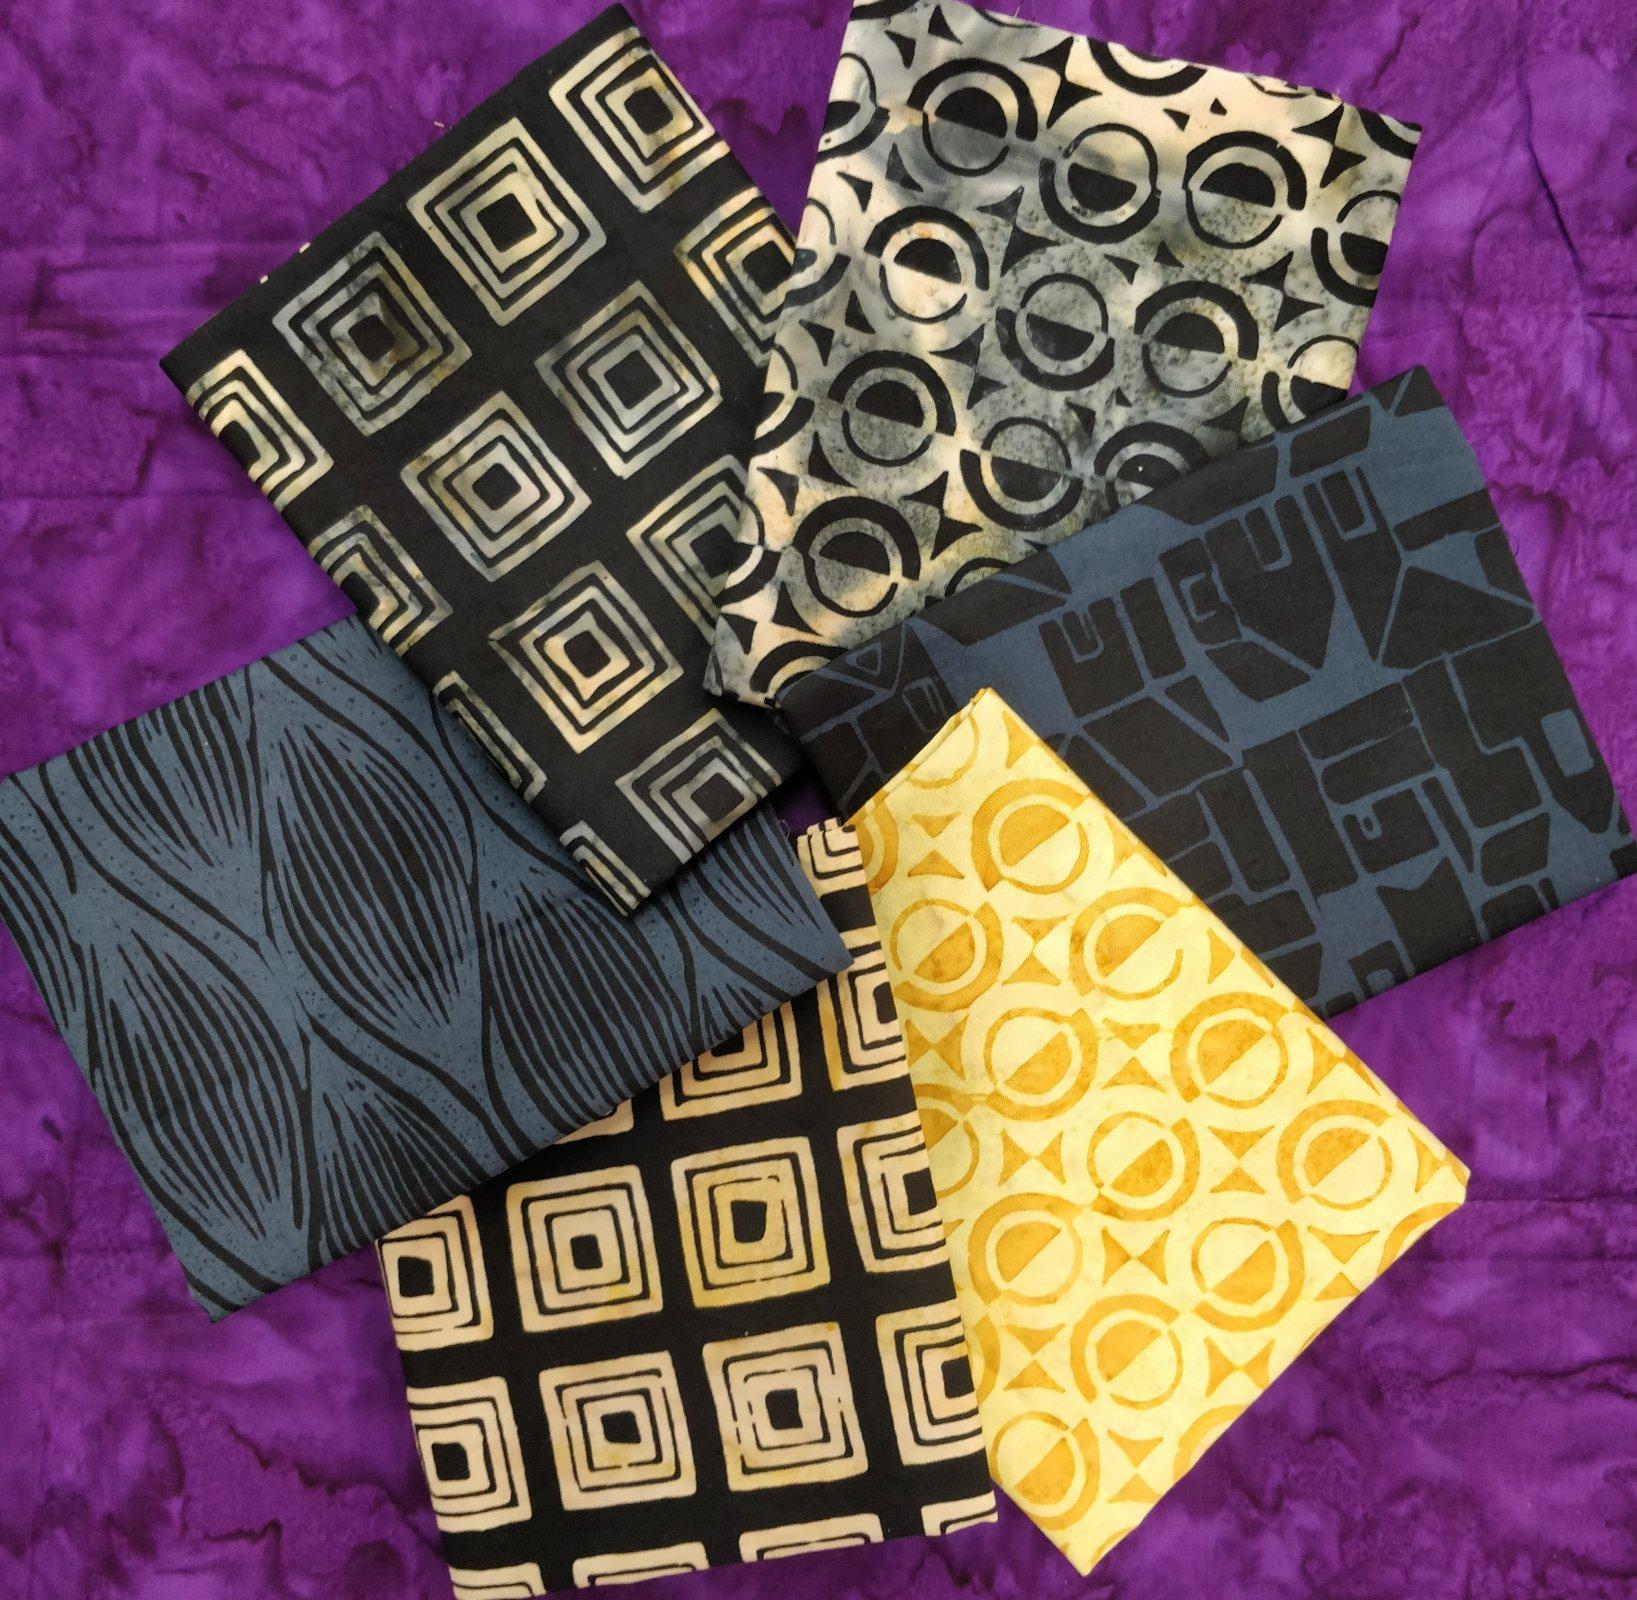 837026 Black/Gold Fat Qrt. Bdle - 6 fabrics $18.00